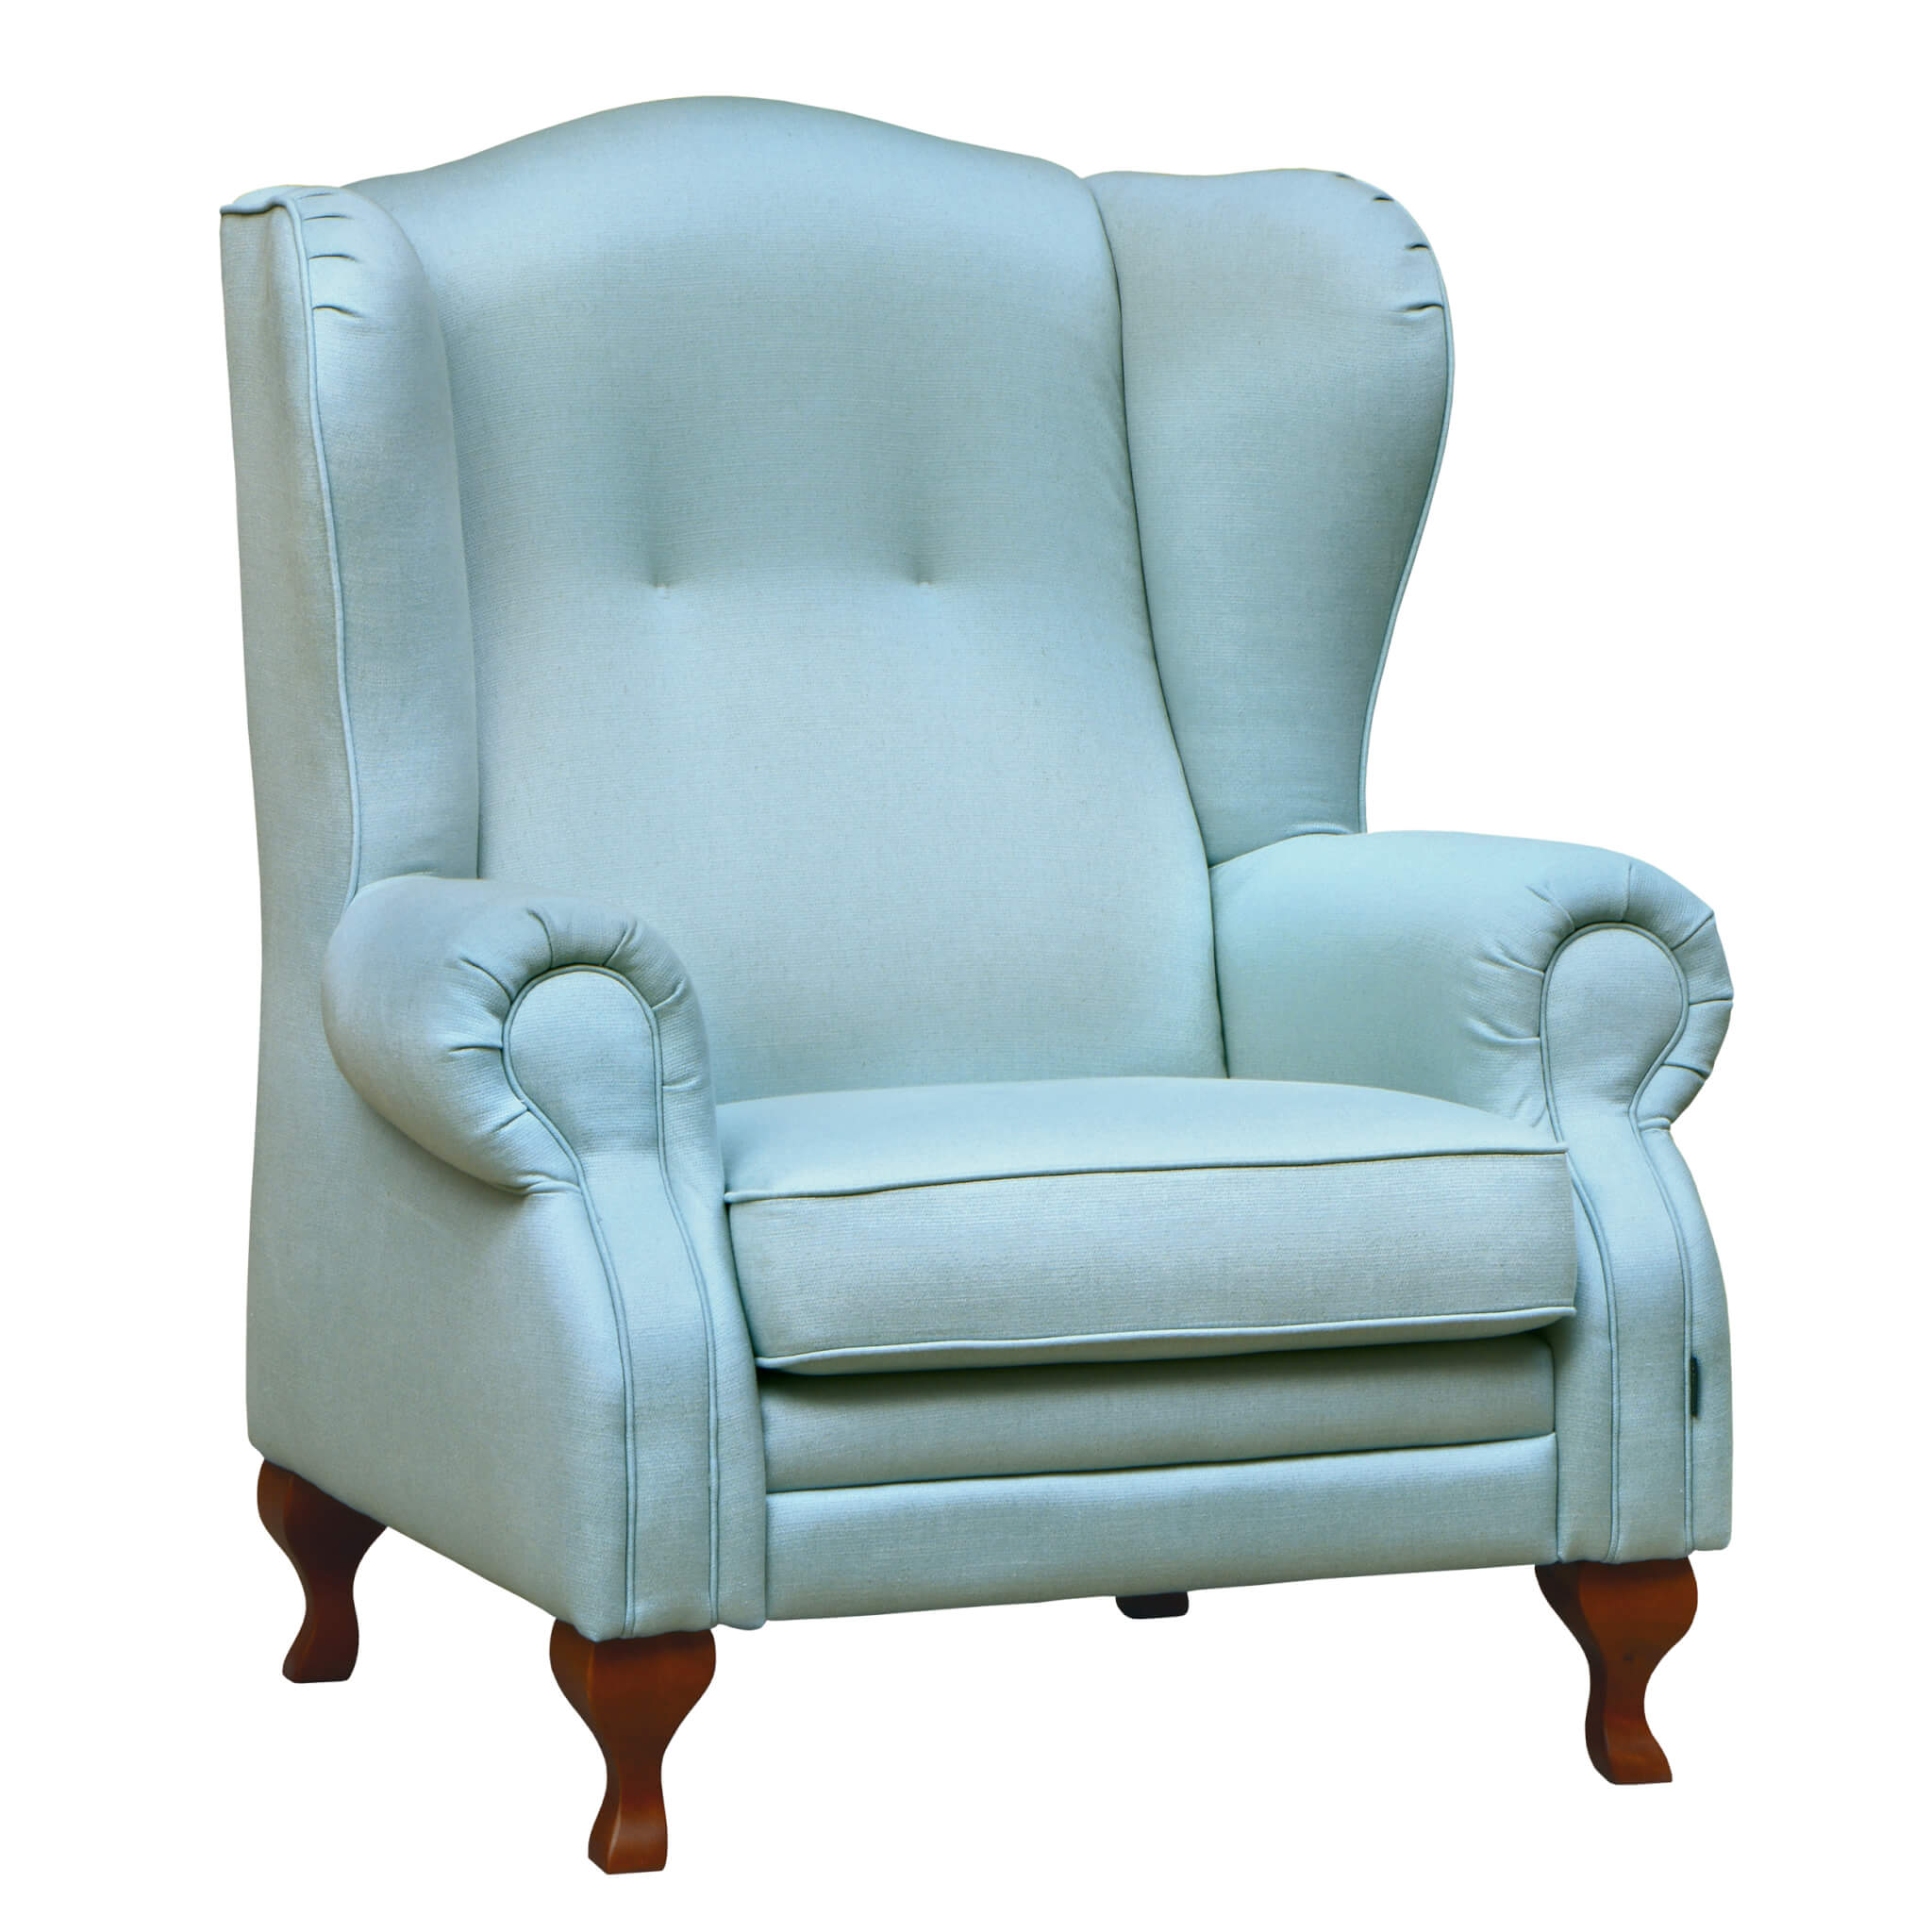 ohrensessel queen ann ph nix sch ner leben. Black Bedroom Furniture Sets. Home Design Ideas